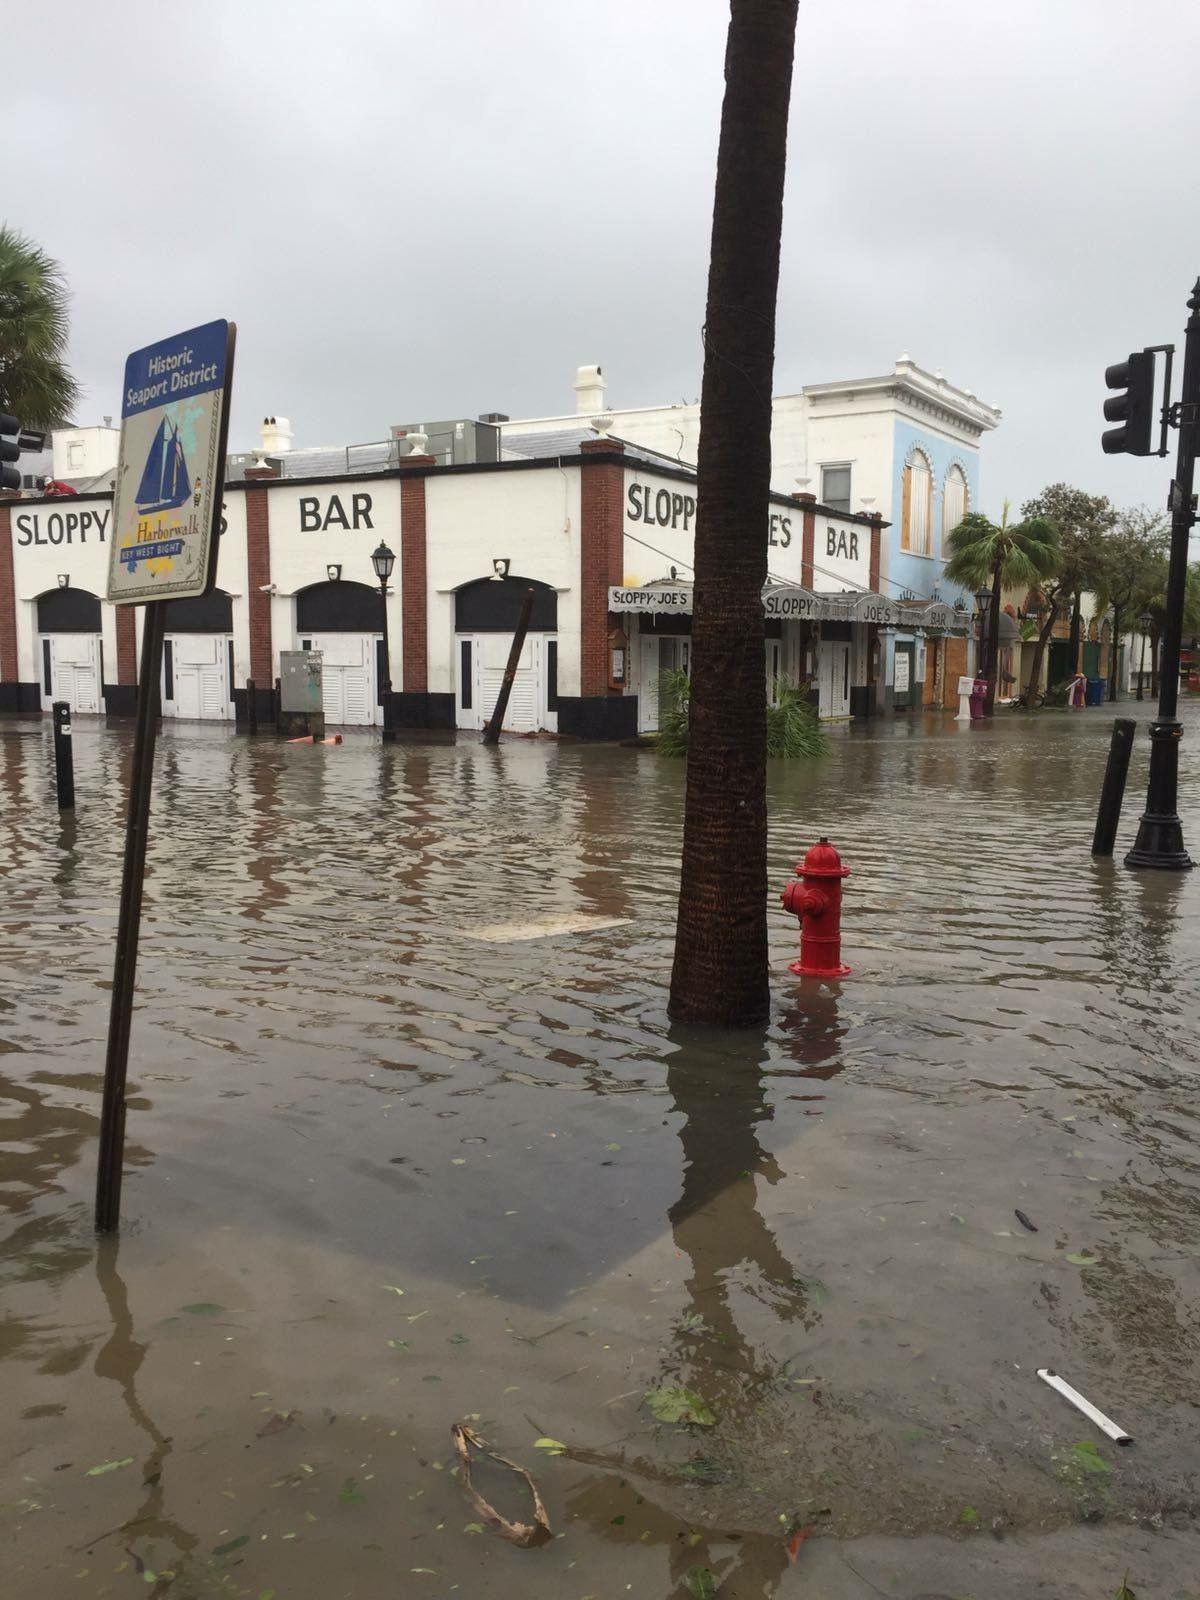 Sloppy Joe S In Key West After Hurricane Irma Key West Atlantic Hurricane Favorite Places